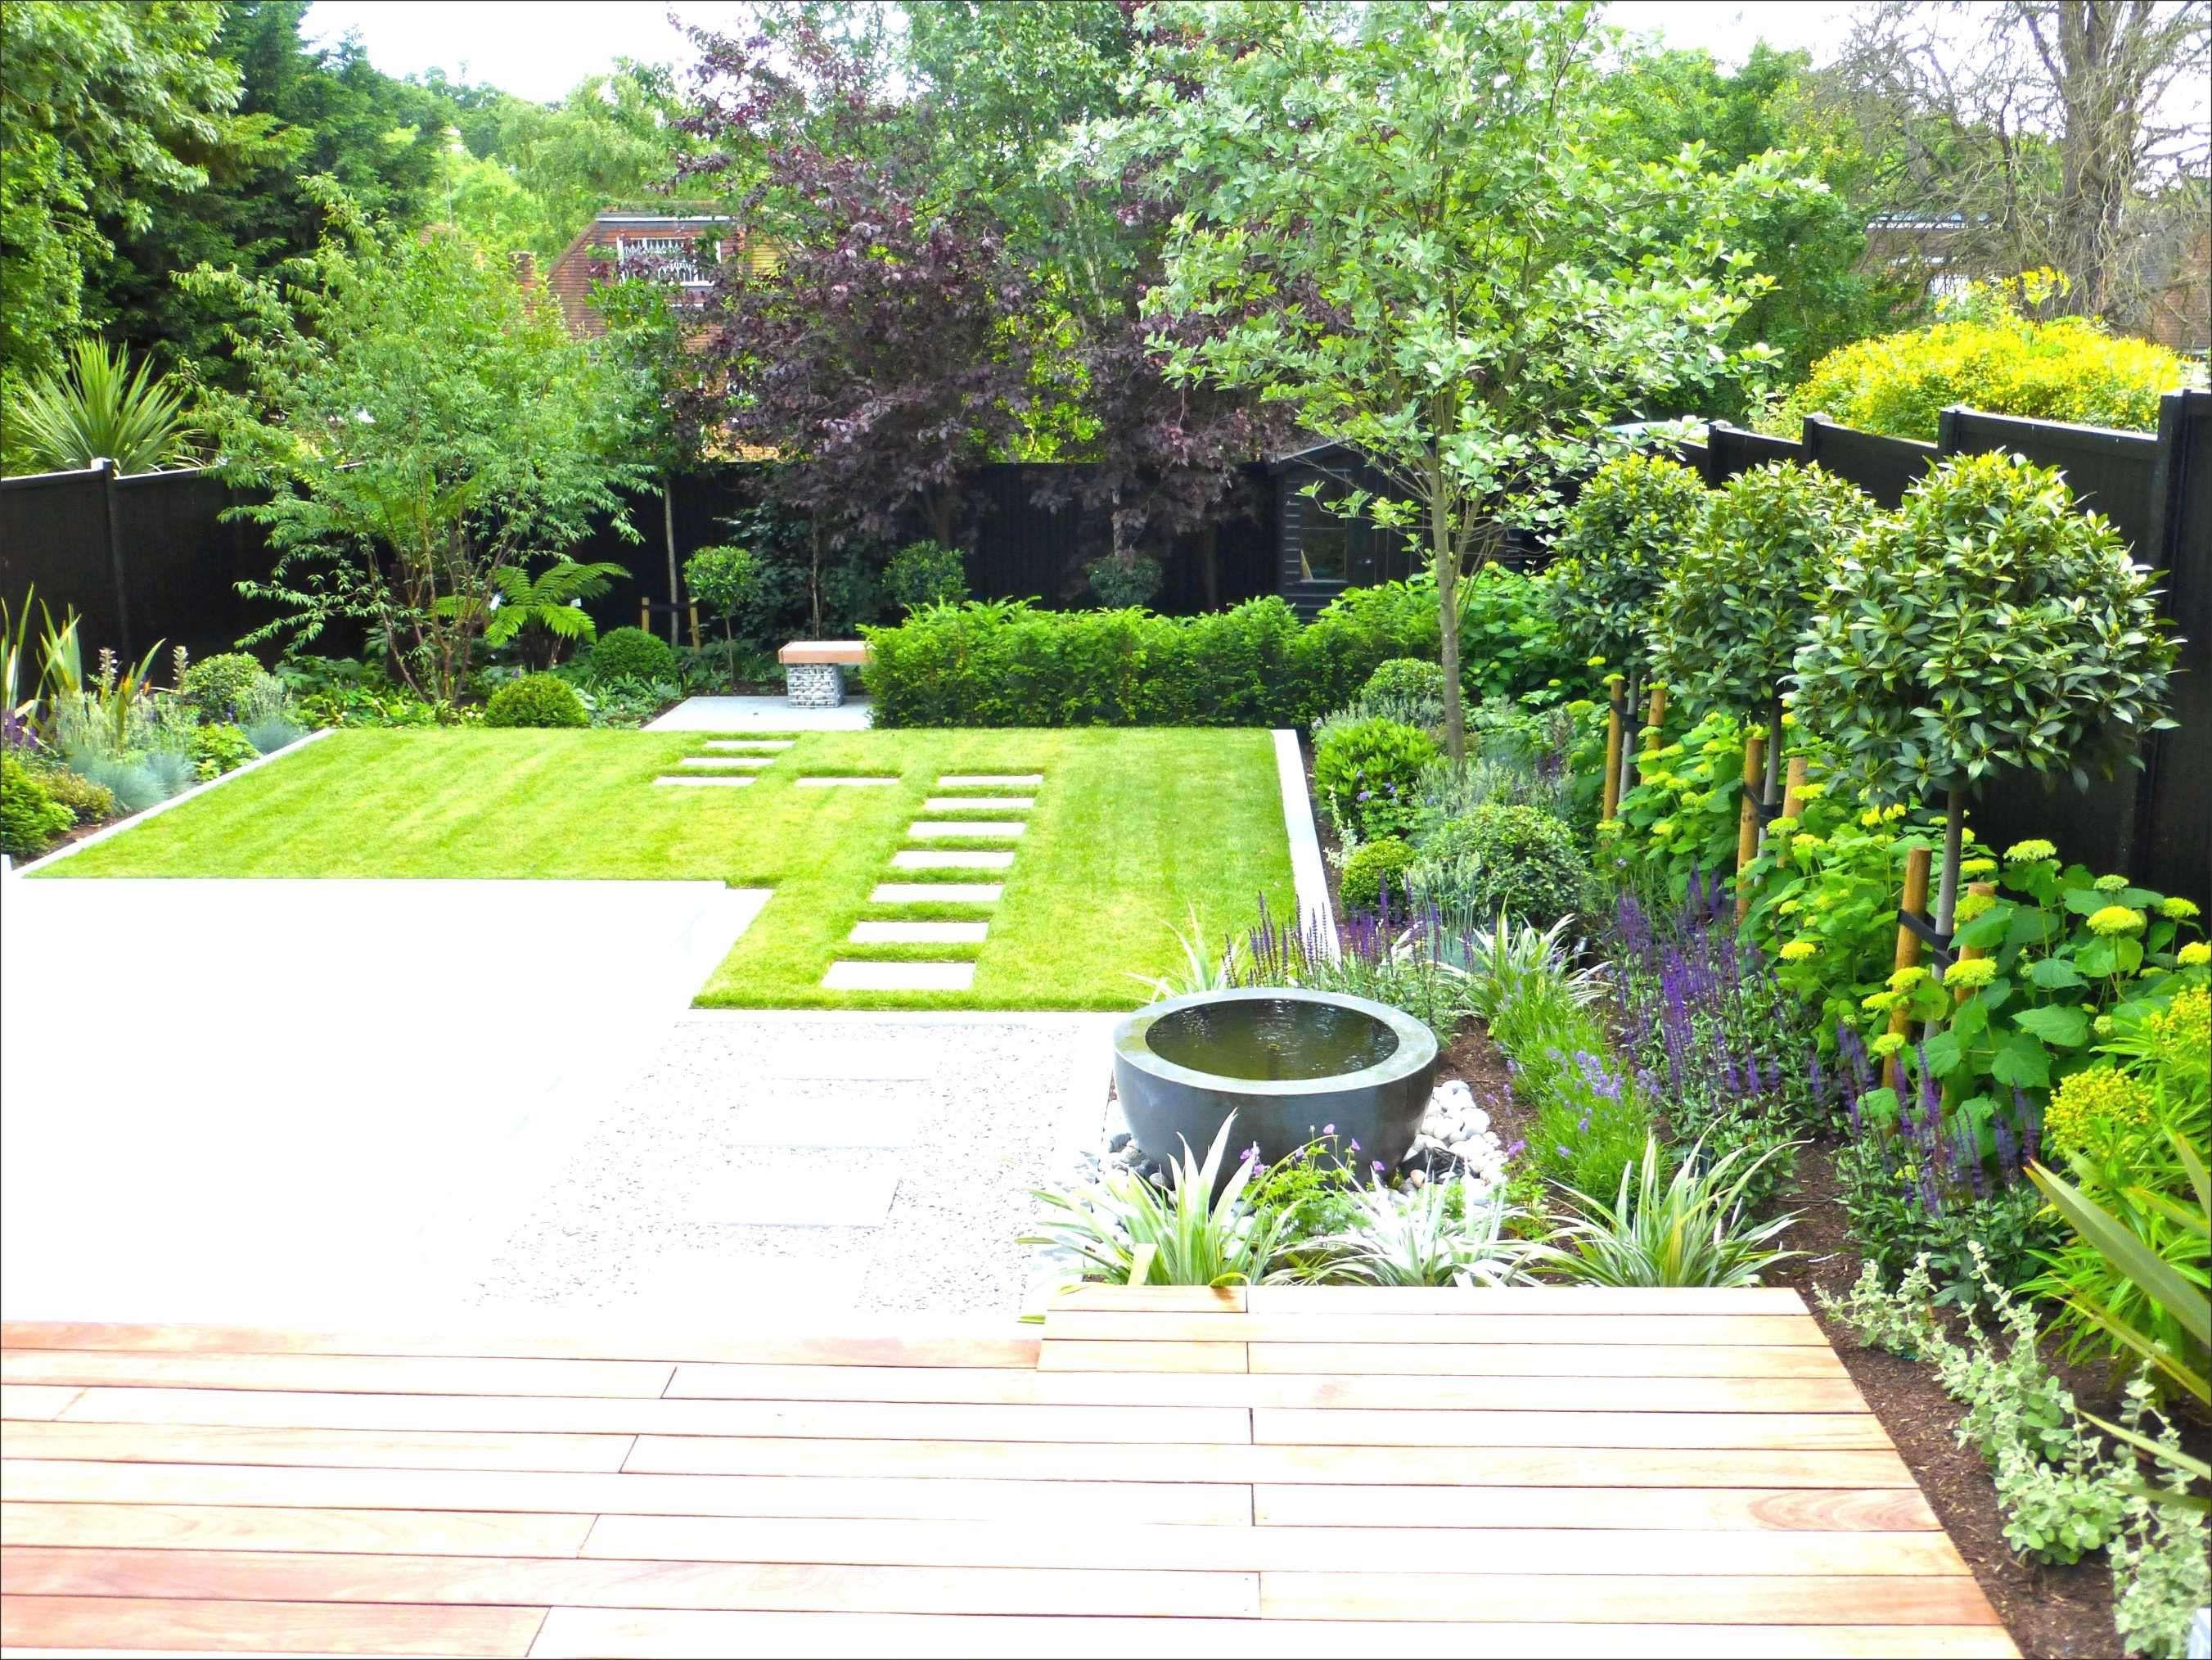 30 Reizend Pflegeleichter Garten Anlegen Garten Gallerie Ideen